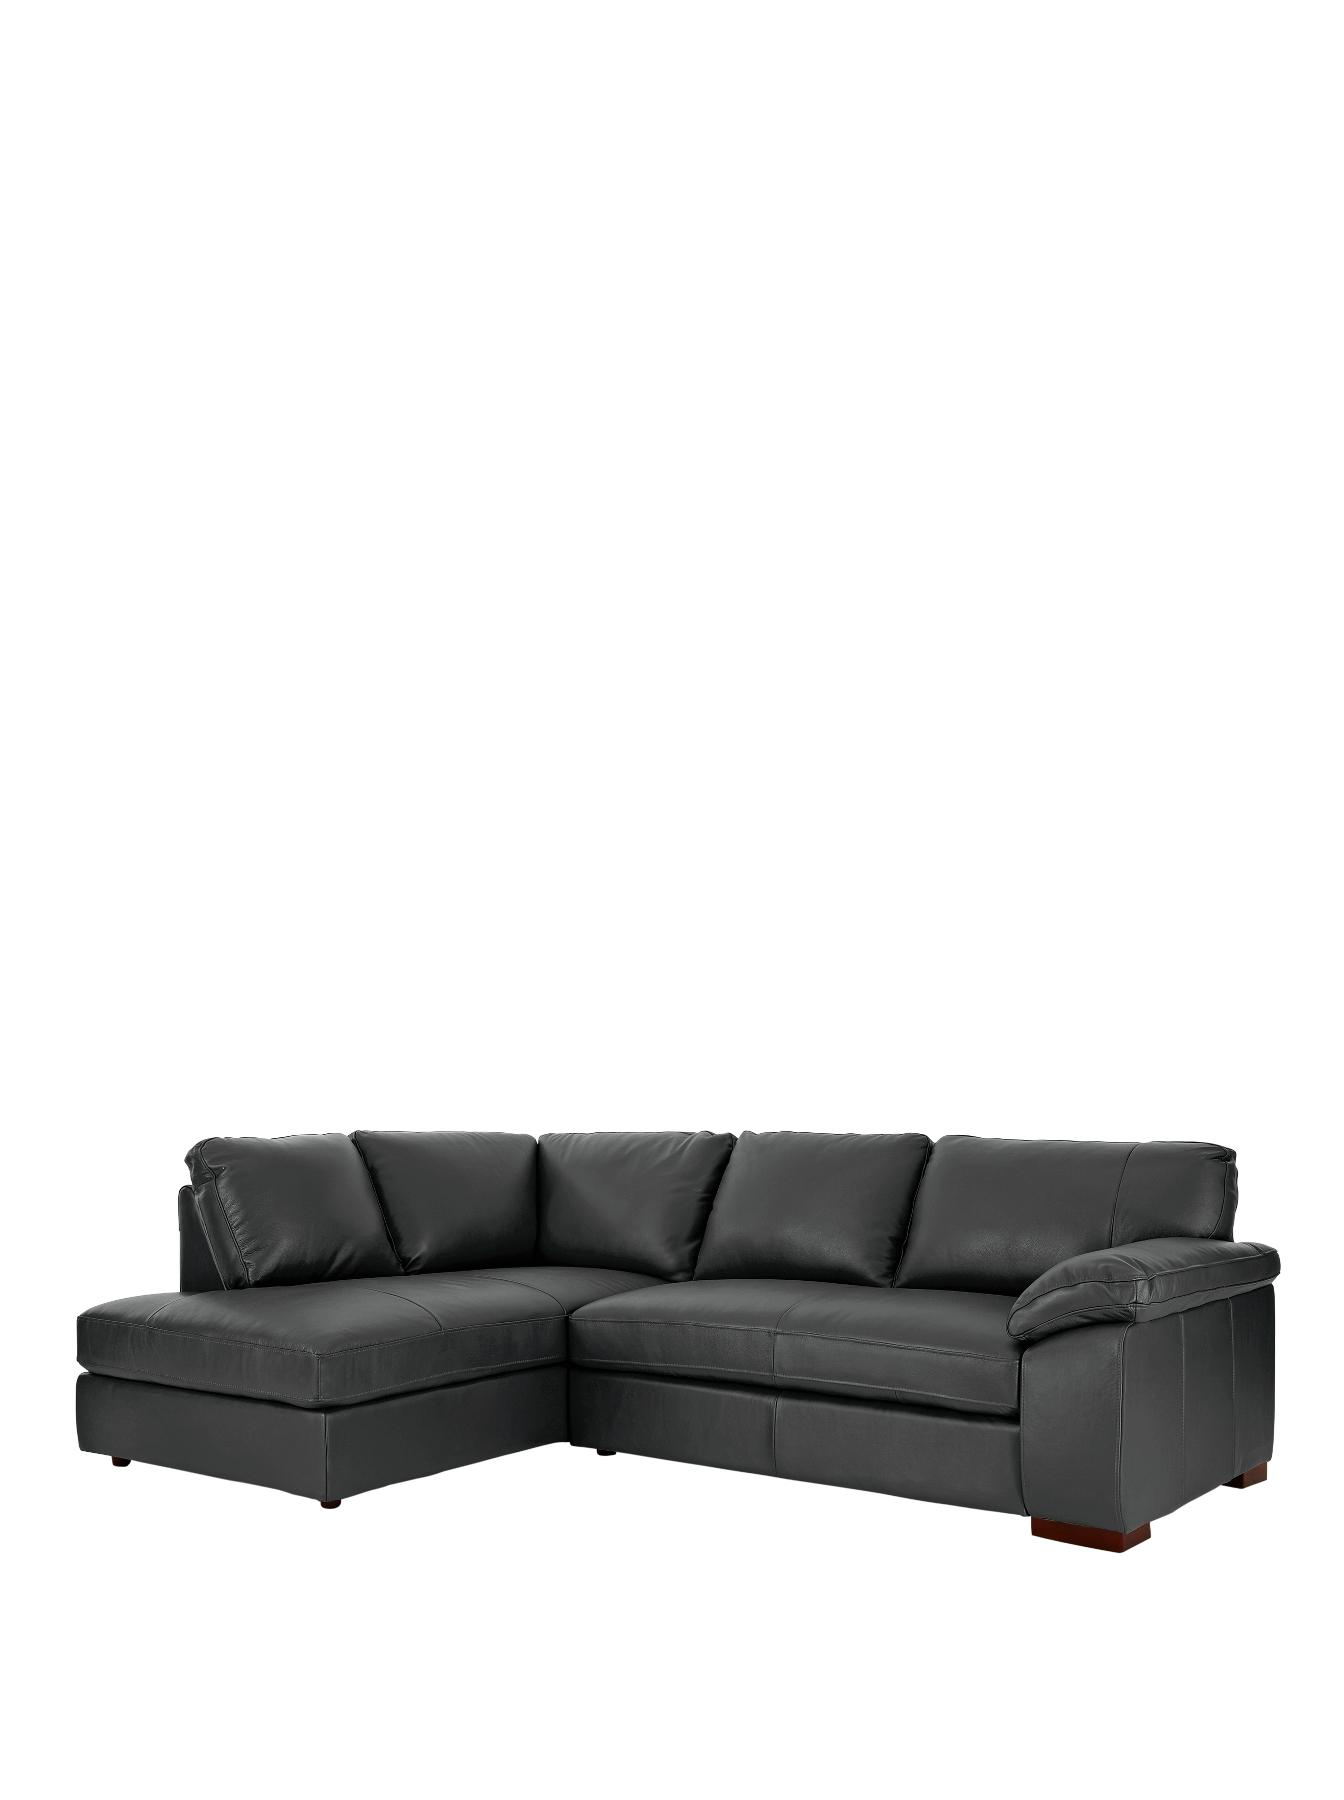 Renee Left Hand Leather Corner Group Sofa BlackTaupe